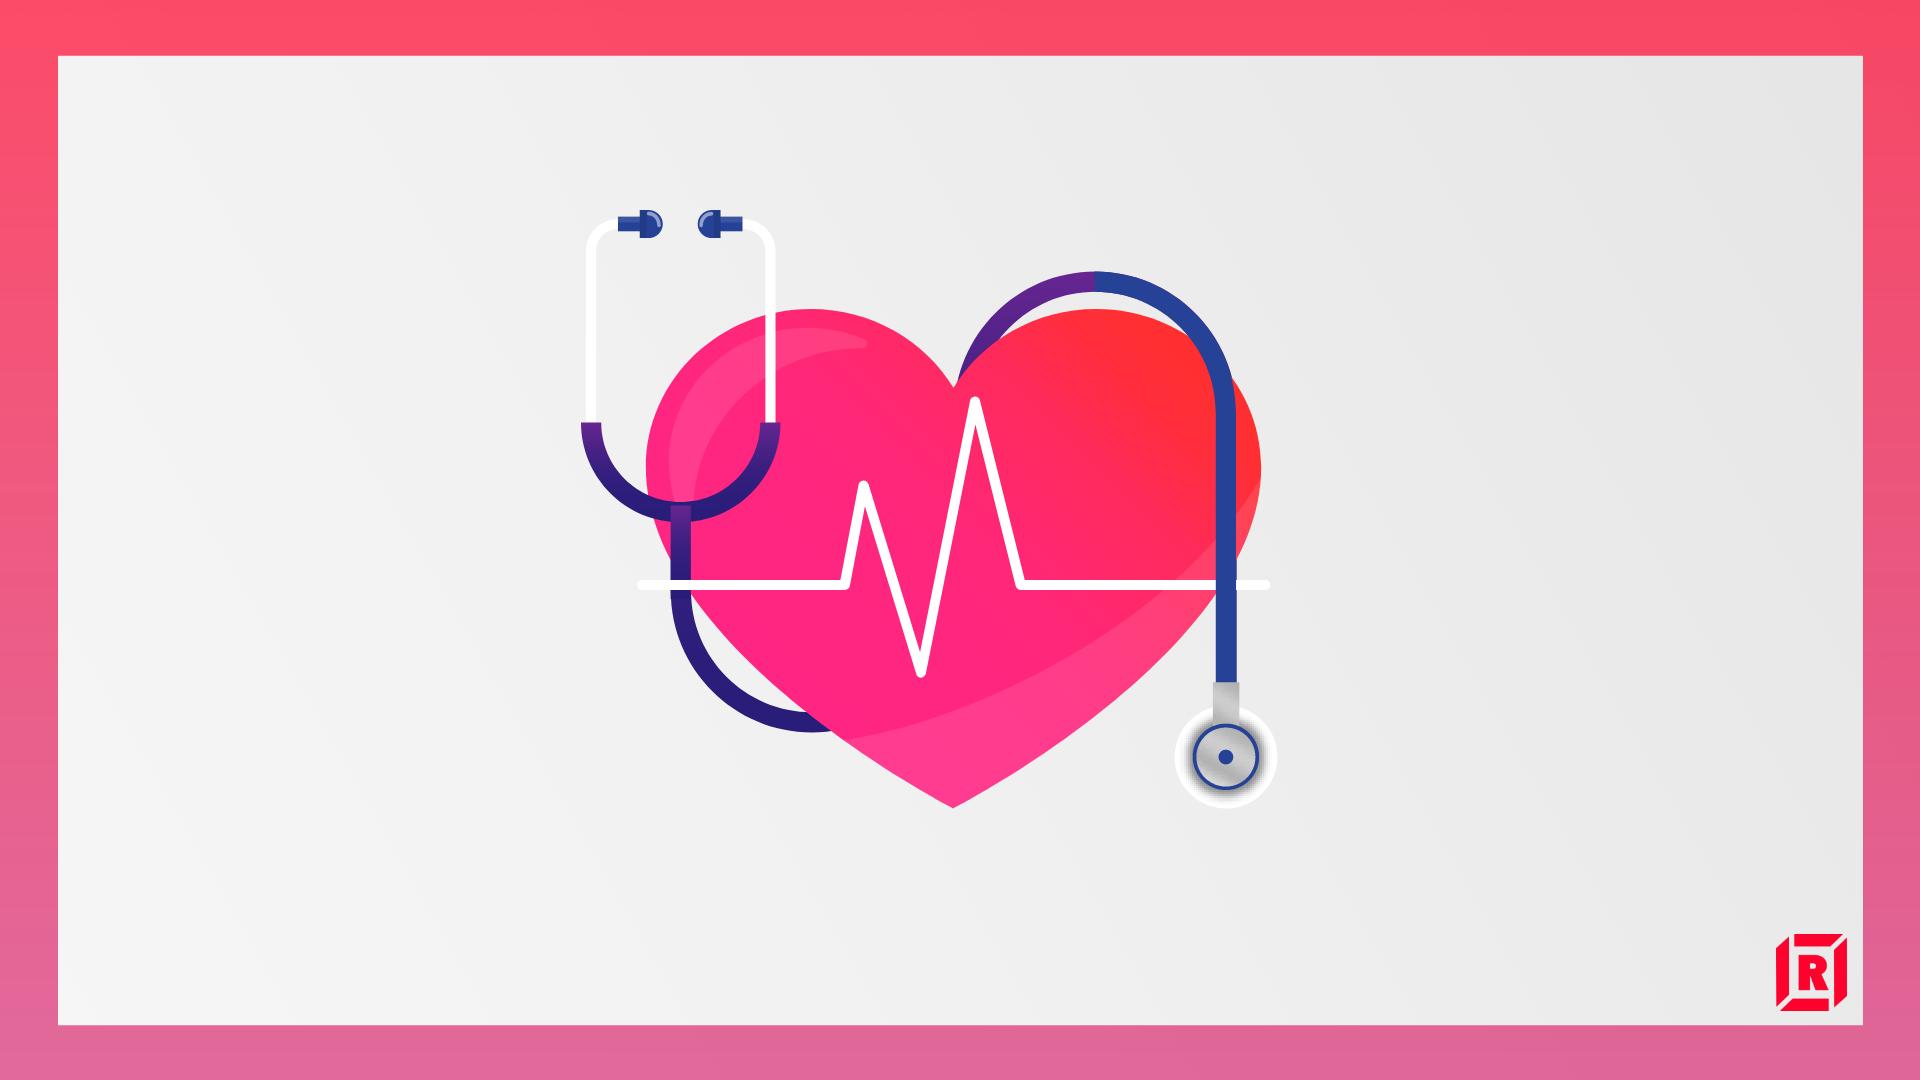 Employee benefits: health &wellness